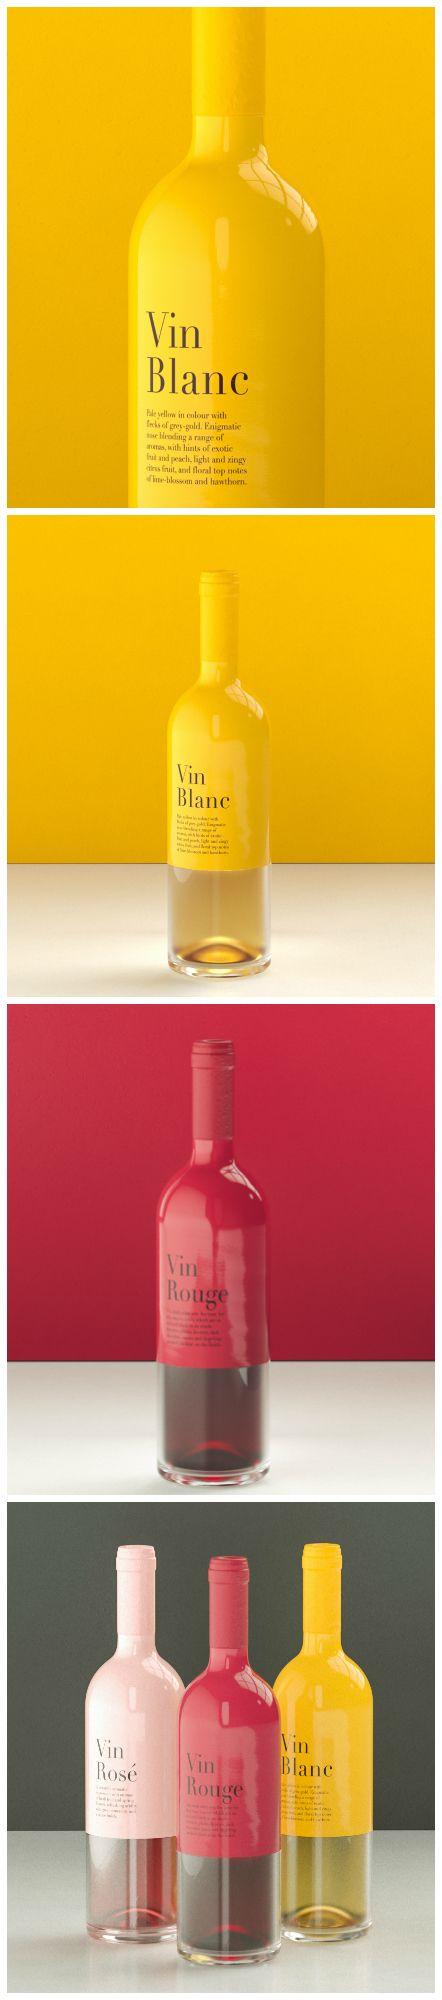 Ali Sahba The Colour Of Aroma Concept World Brand Design Society Vin Blanc Vin Minimaliste